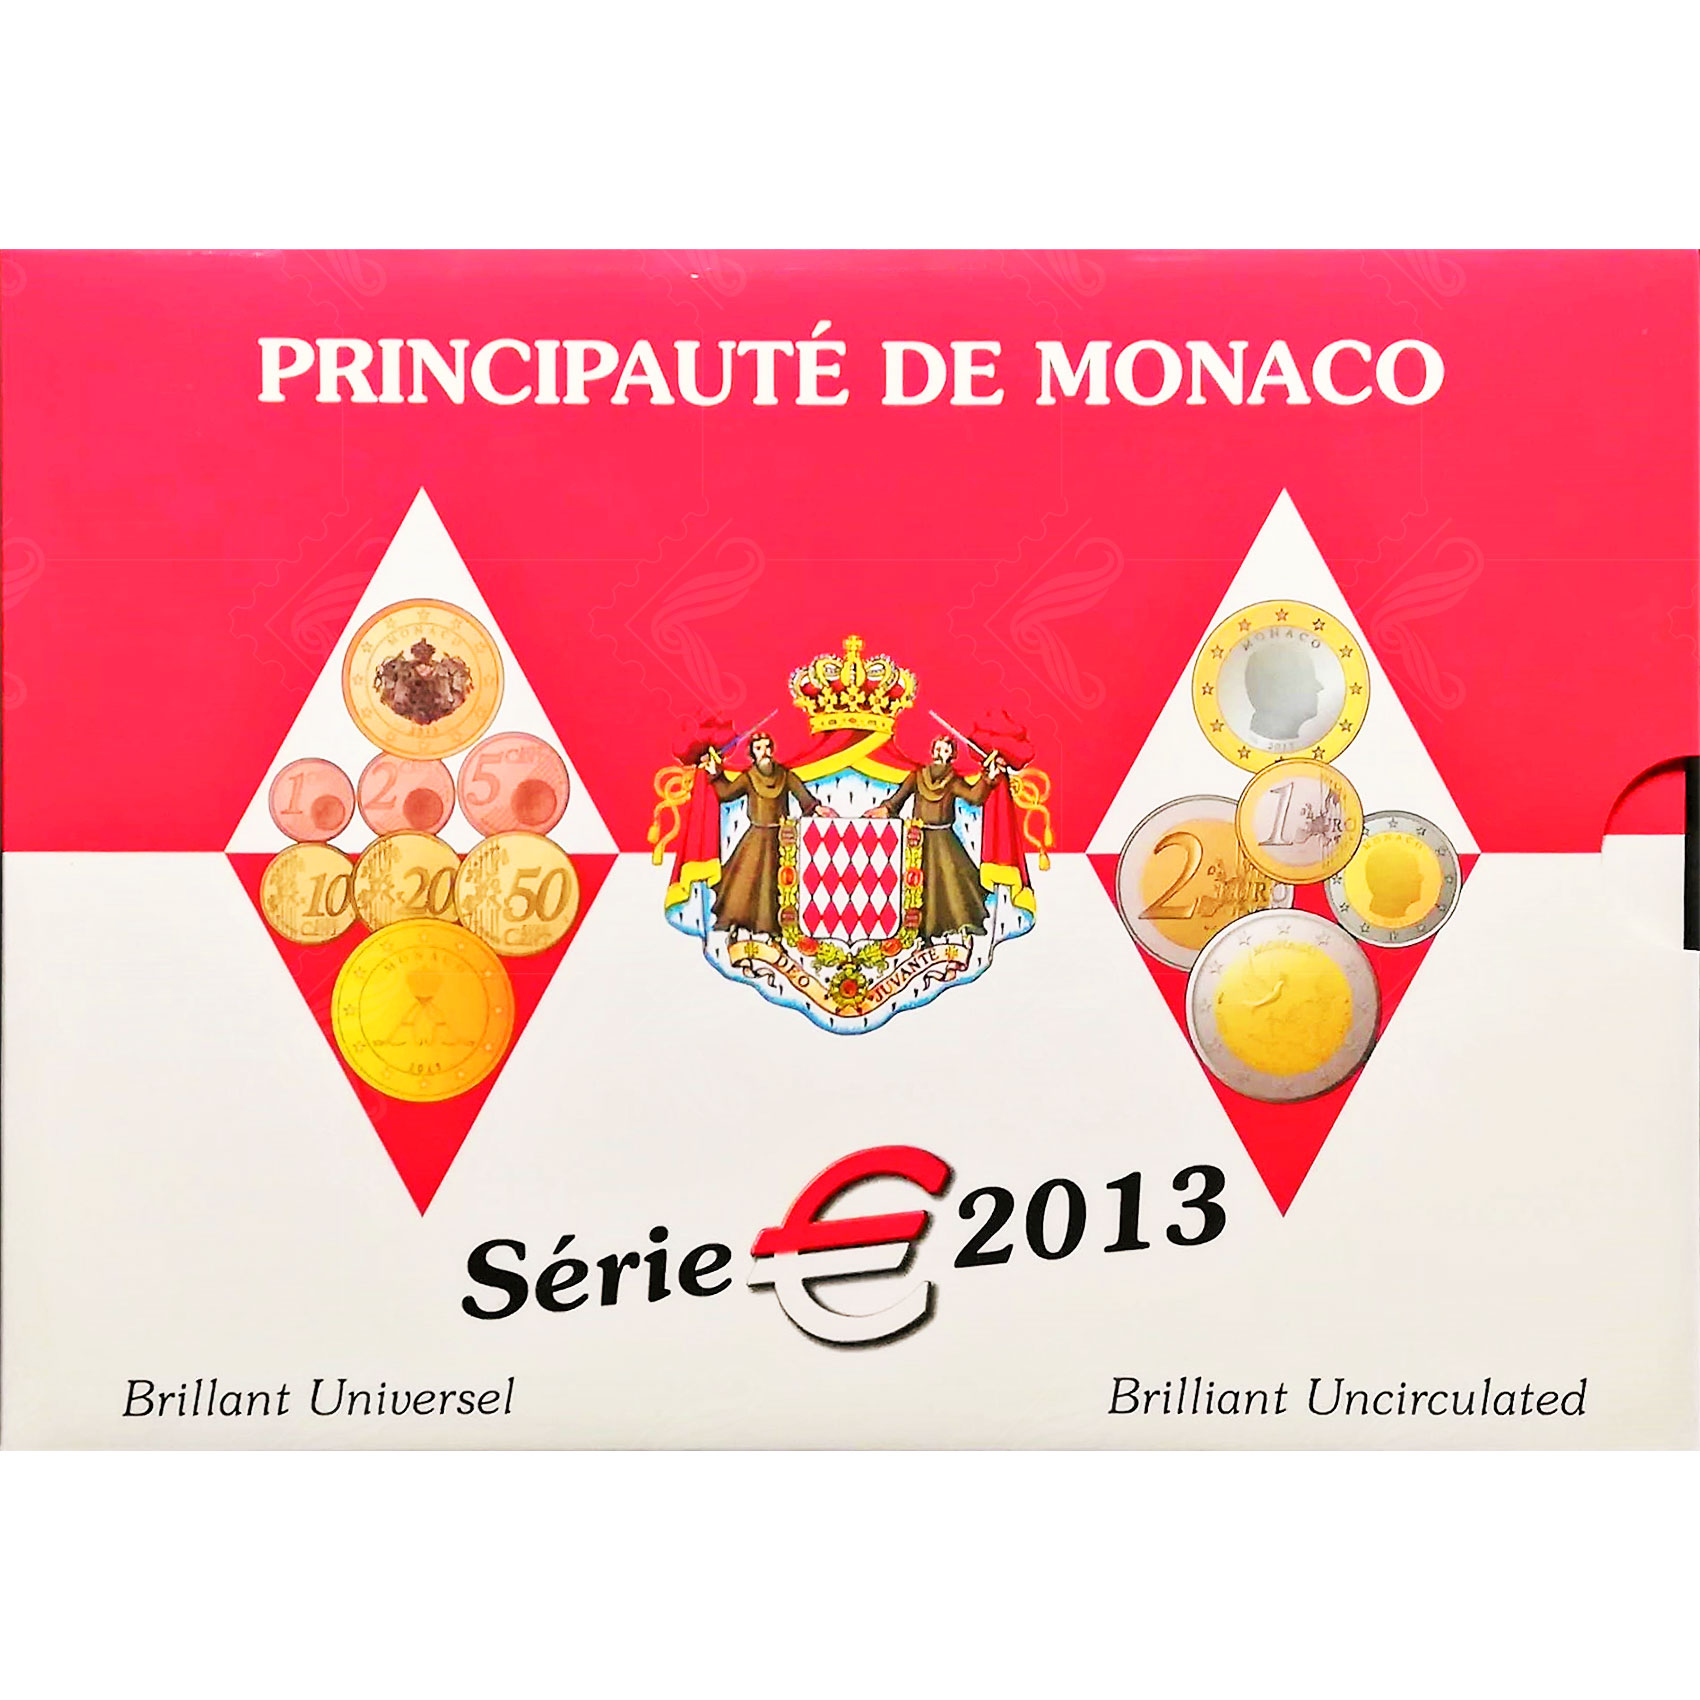 Divisionale Monaco 2013